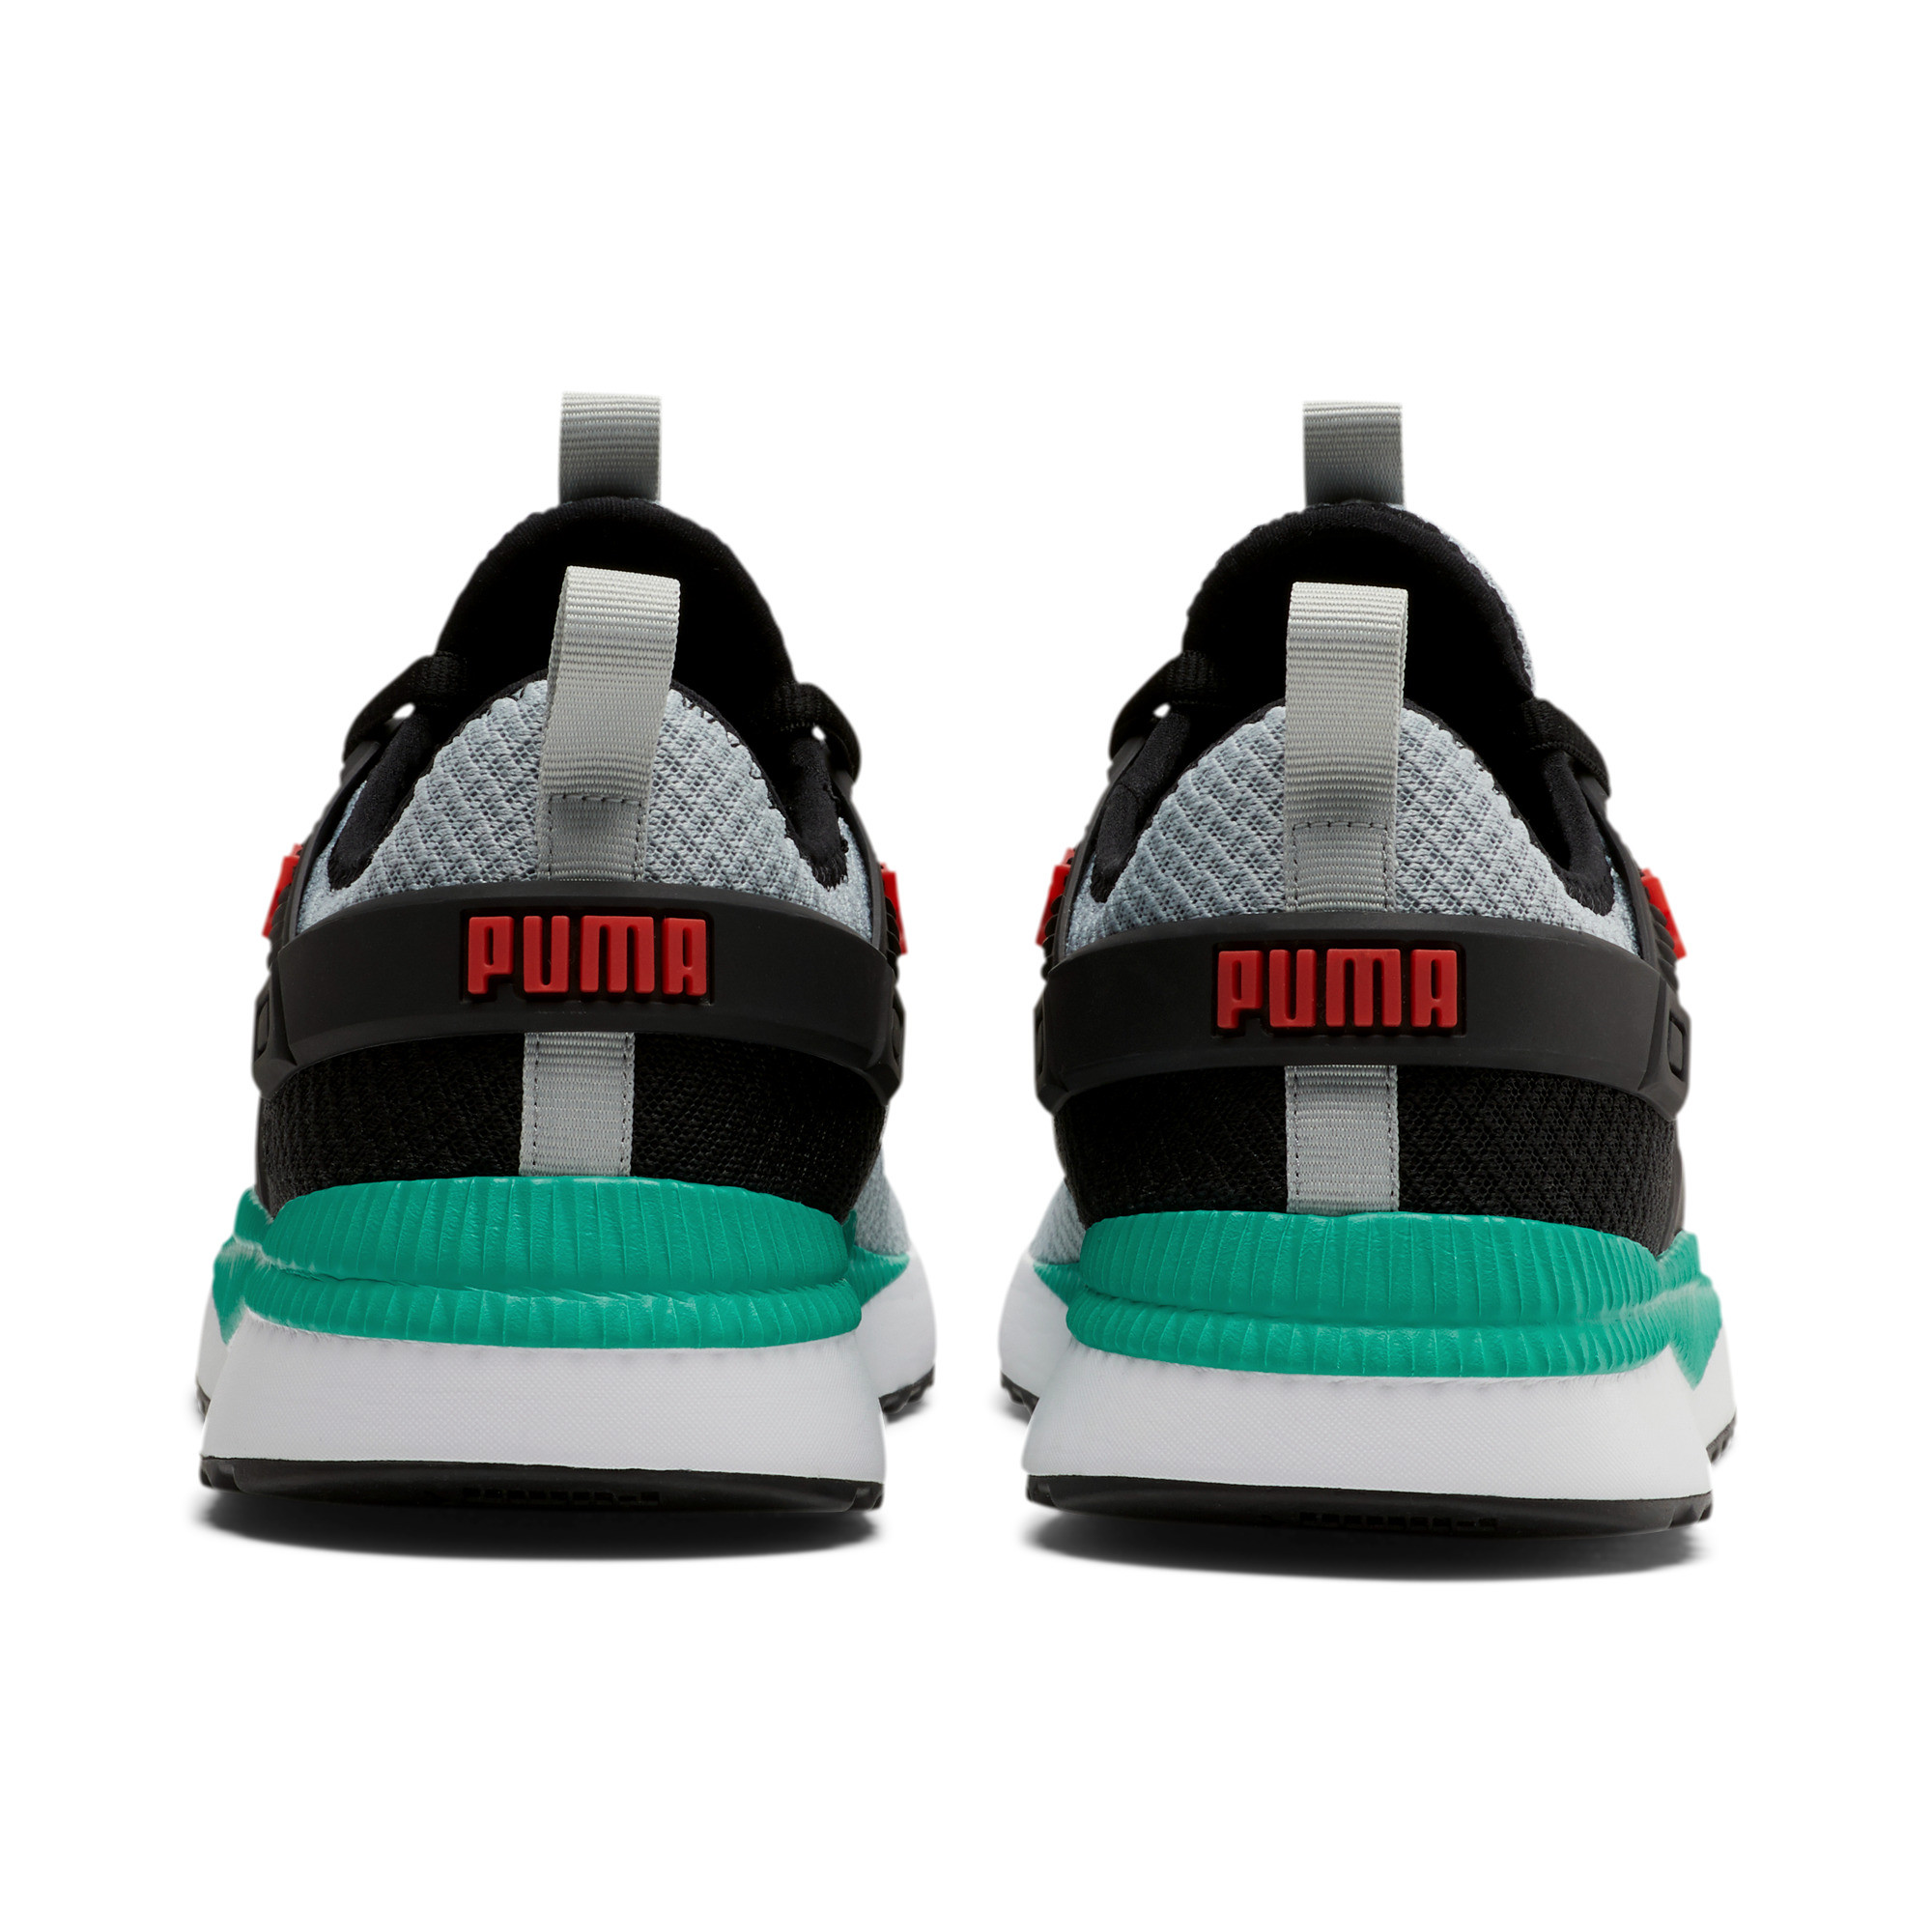 PUMA-Unisex-Pacer-Next-Excel-Mesh-Training-Shoes thumbnail 3